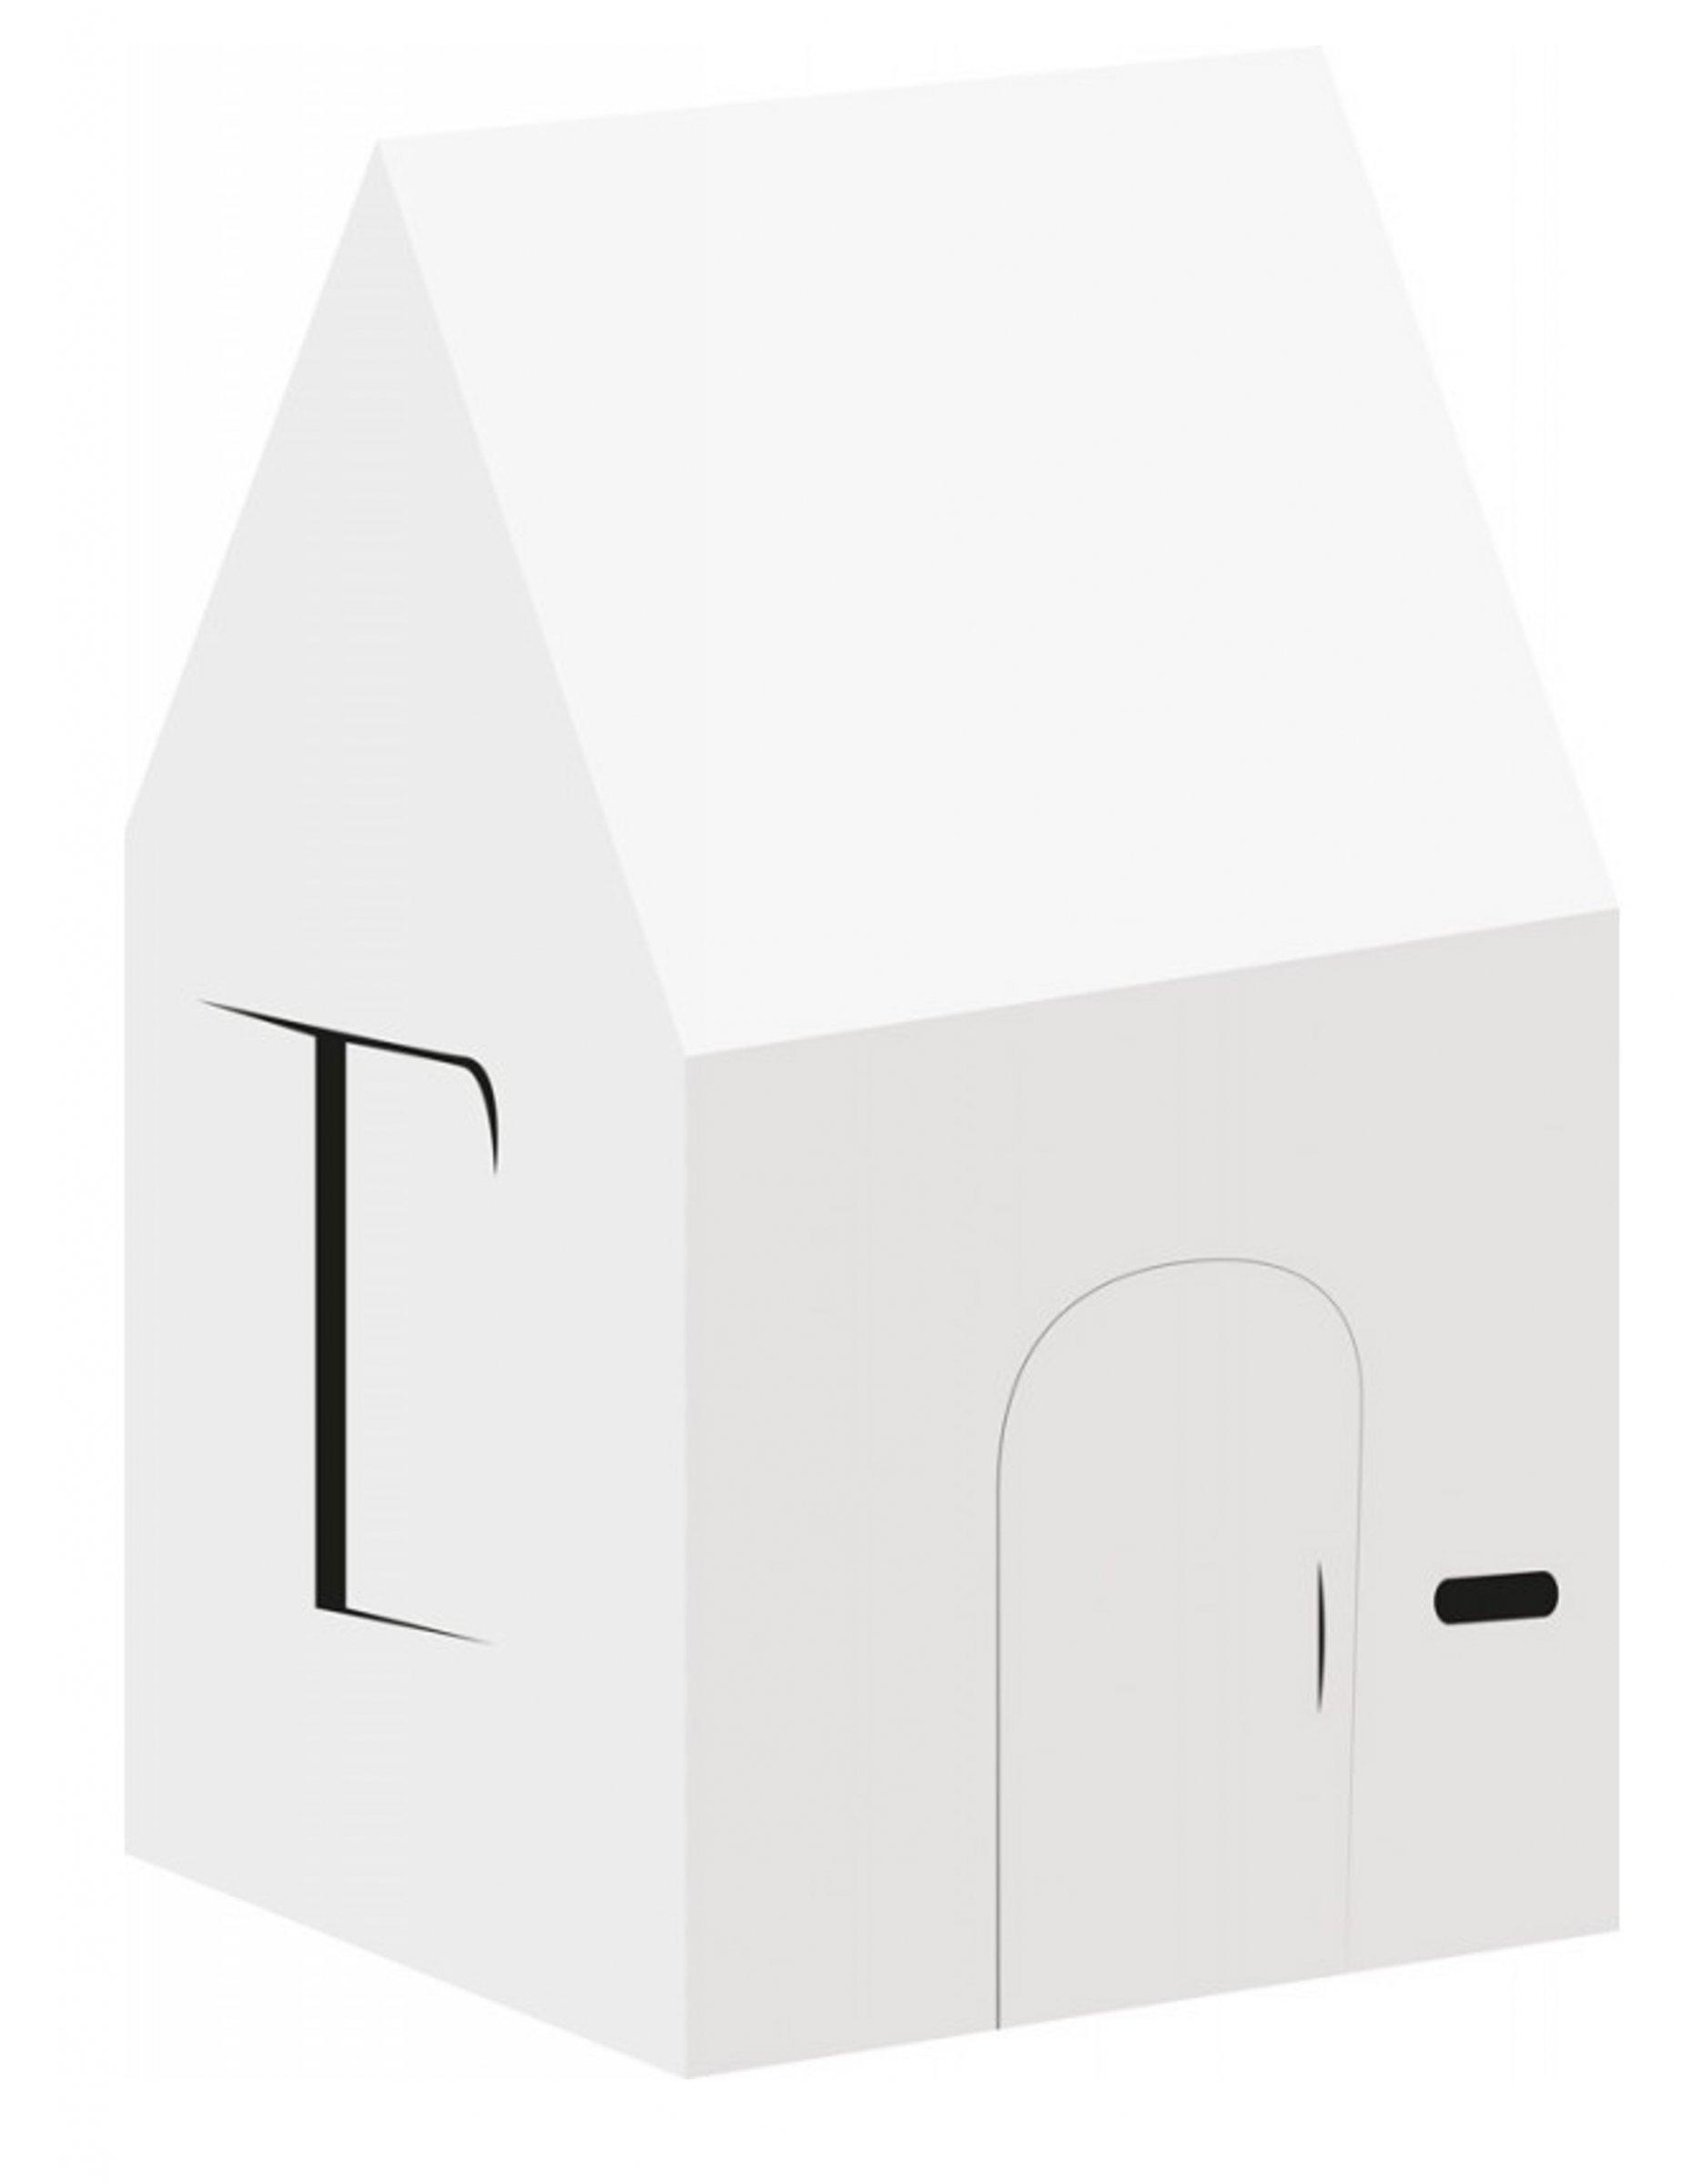 haus aus karton f r kinder 120 x 86 cm g nstige faschings partydeko zubeh r bei karneval. Black Bedroom Furniture Sets. Home Design Ideas